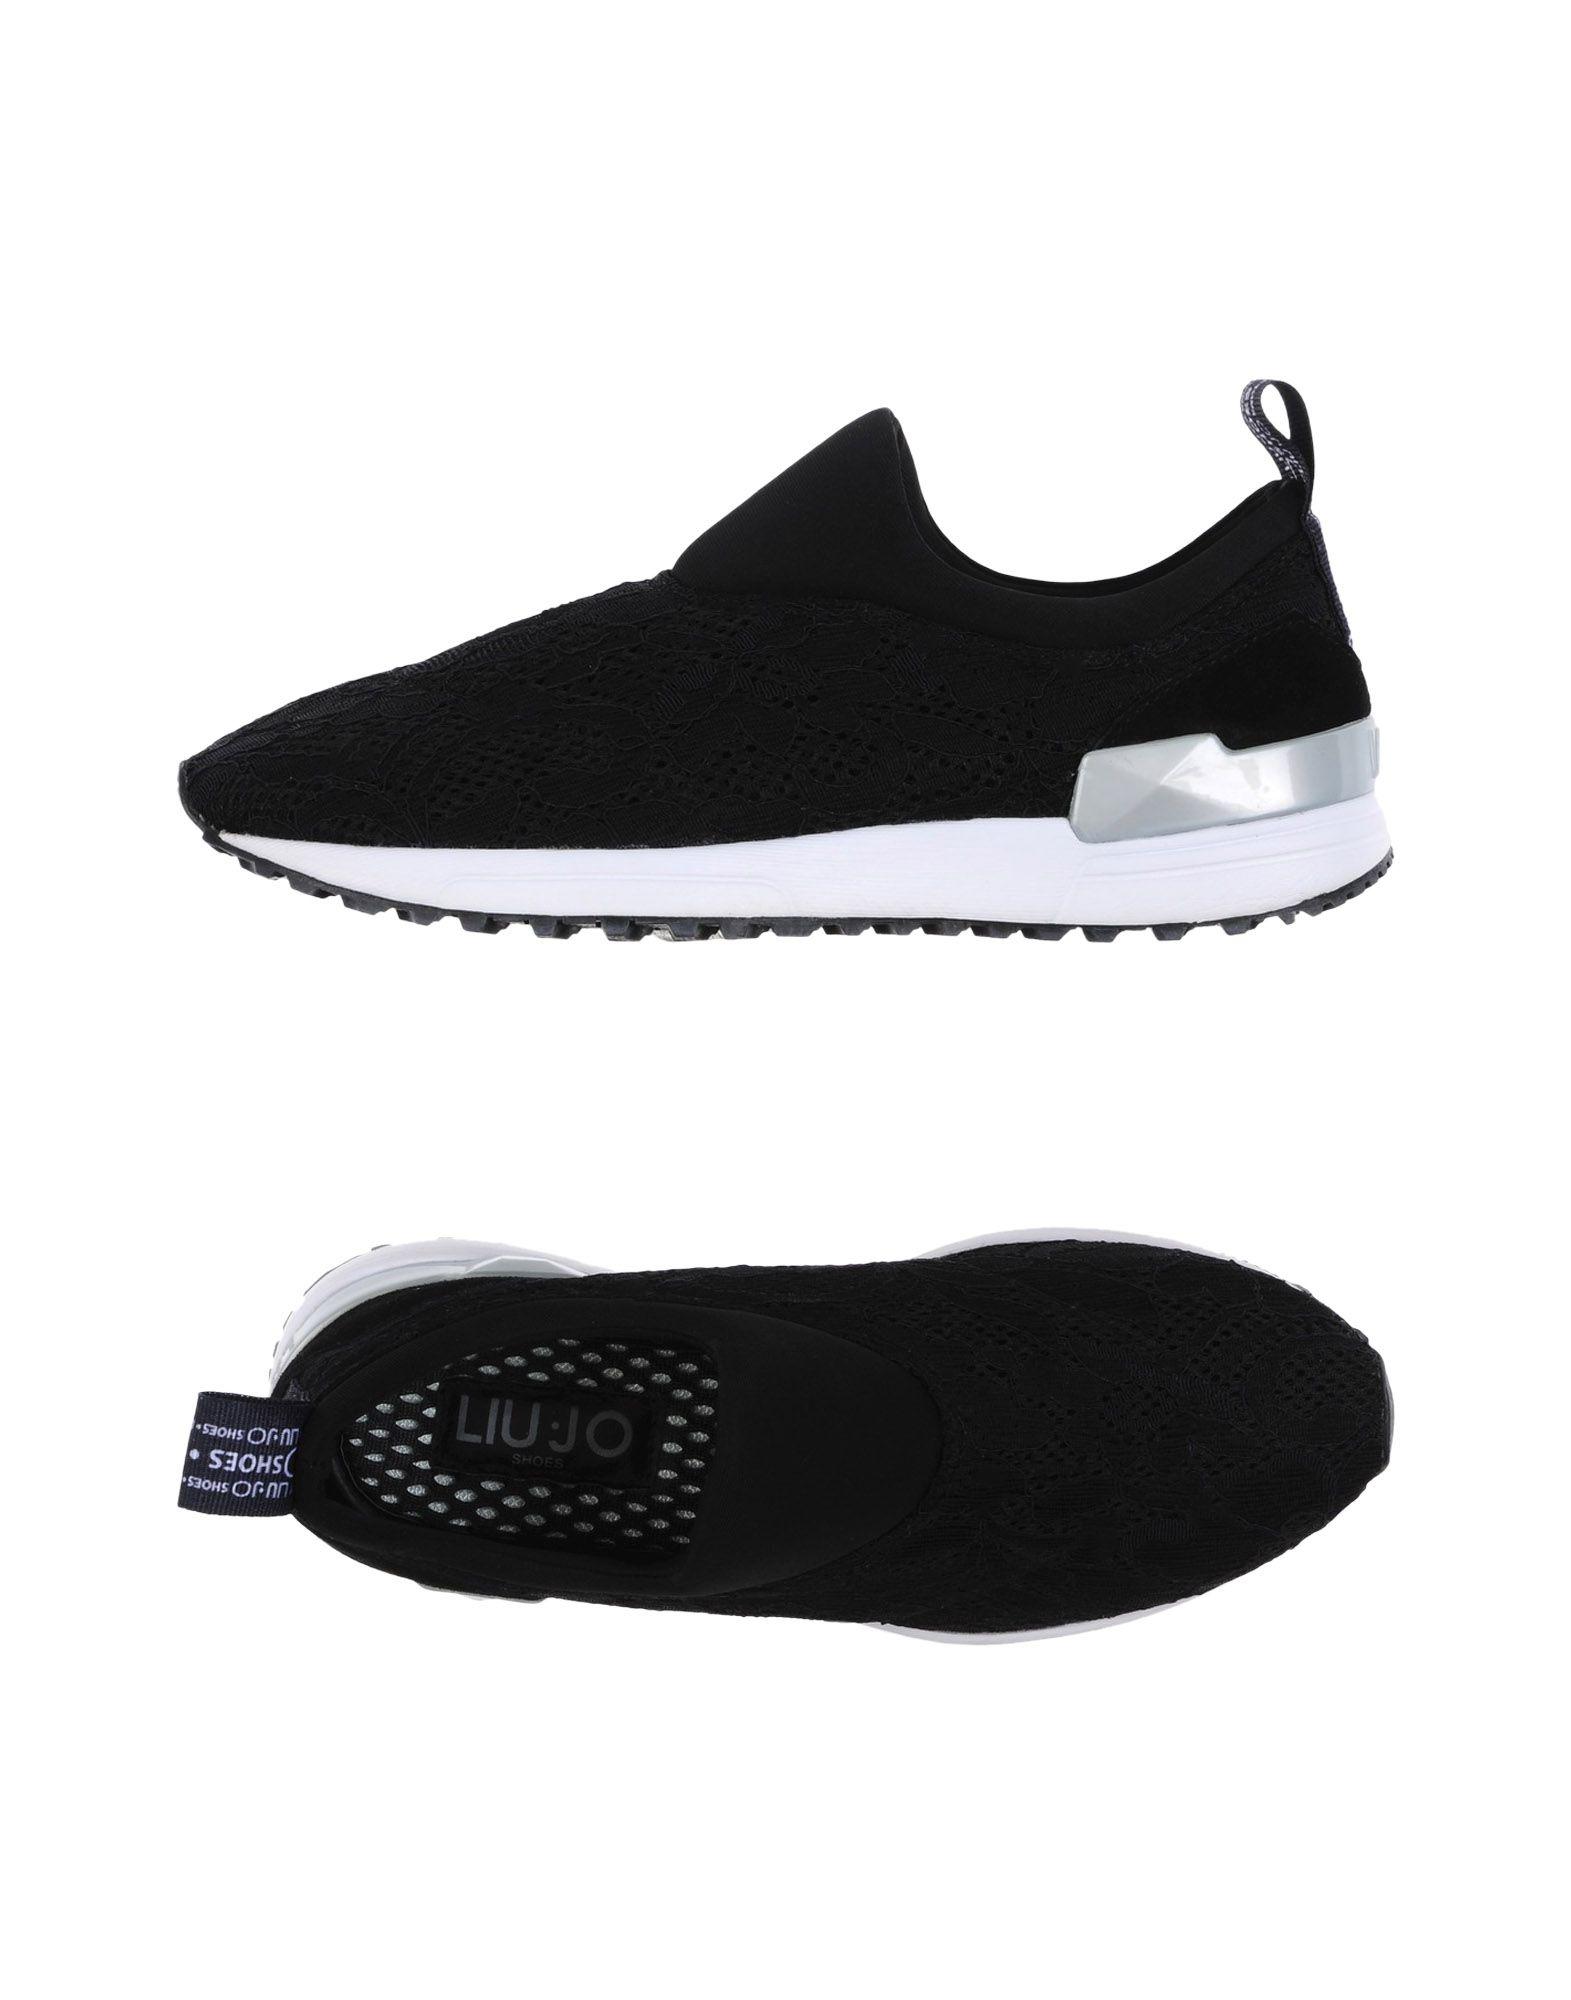 Liu •Jo Shoes  Sneakers Damen  Shoes 11281594JE Gute Qualität beliebte Schuhe 3e6078